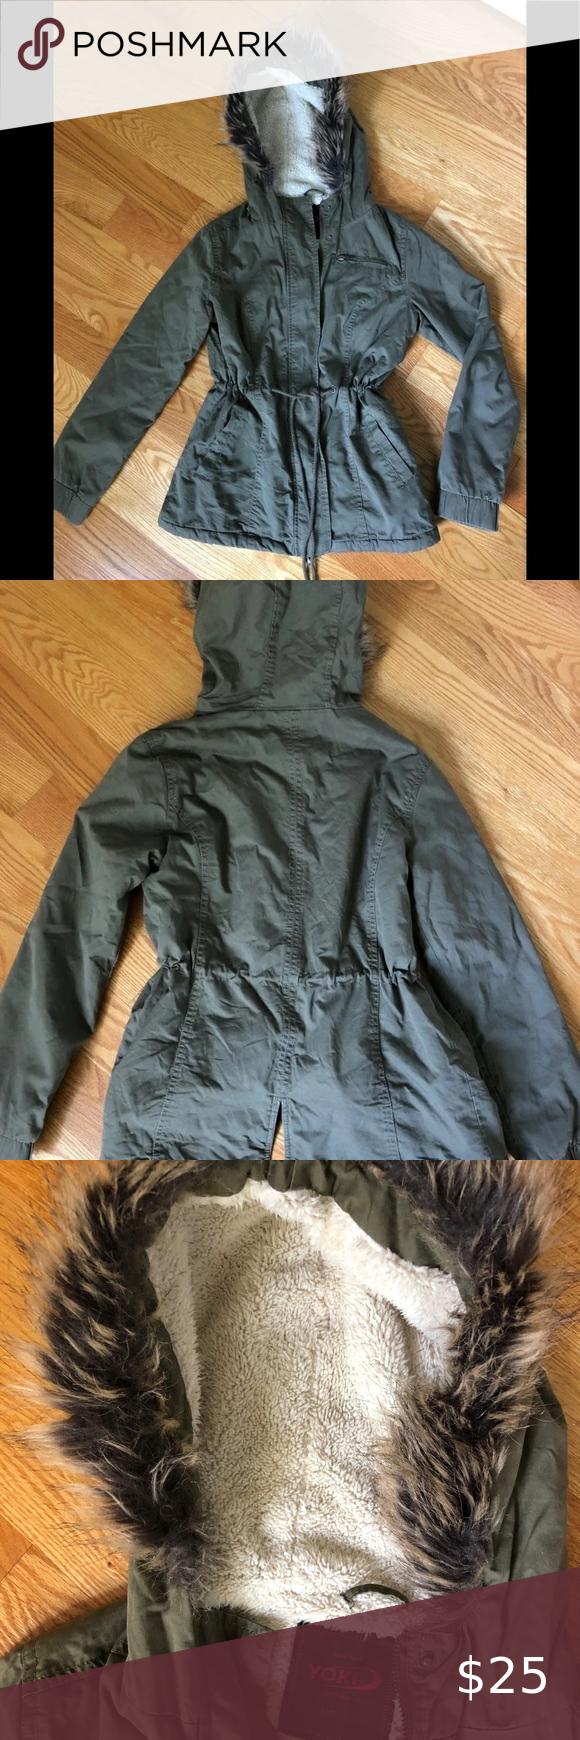 Yoki Jacket Sold Lightweight Anorak Jacket Green Fall Jacket Olive Green Fall Jacket [ 1740 x 580 Pixel ]